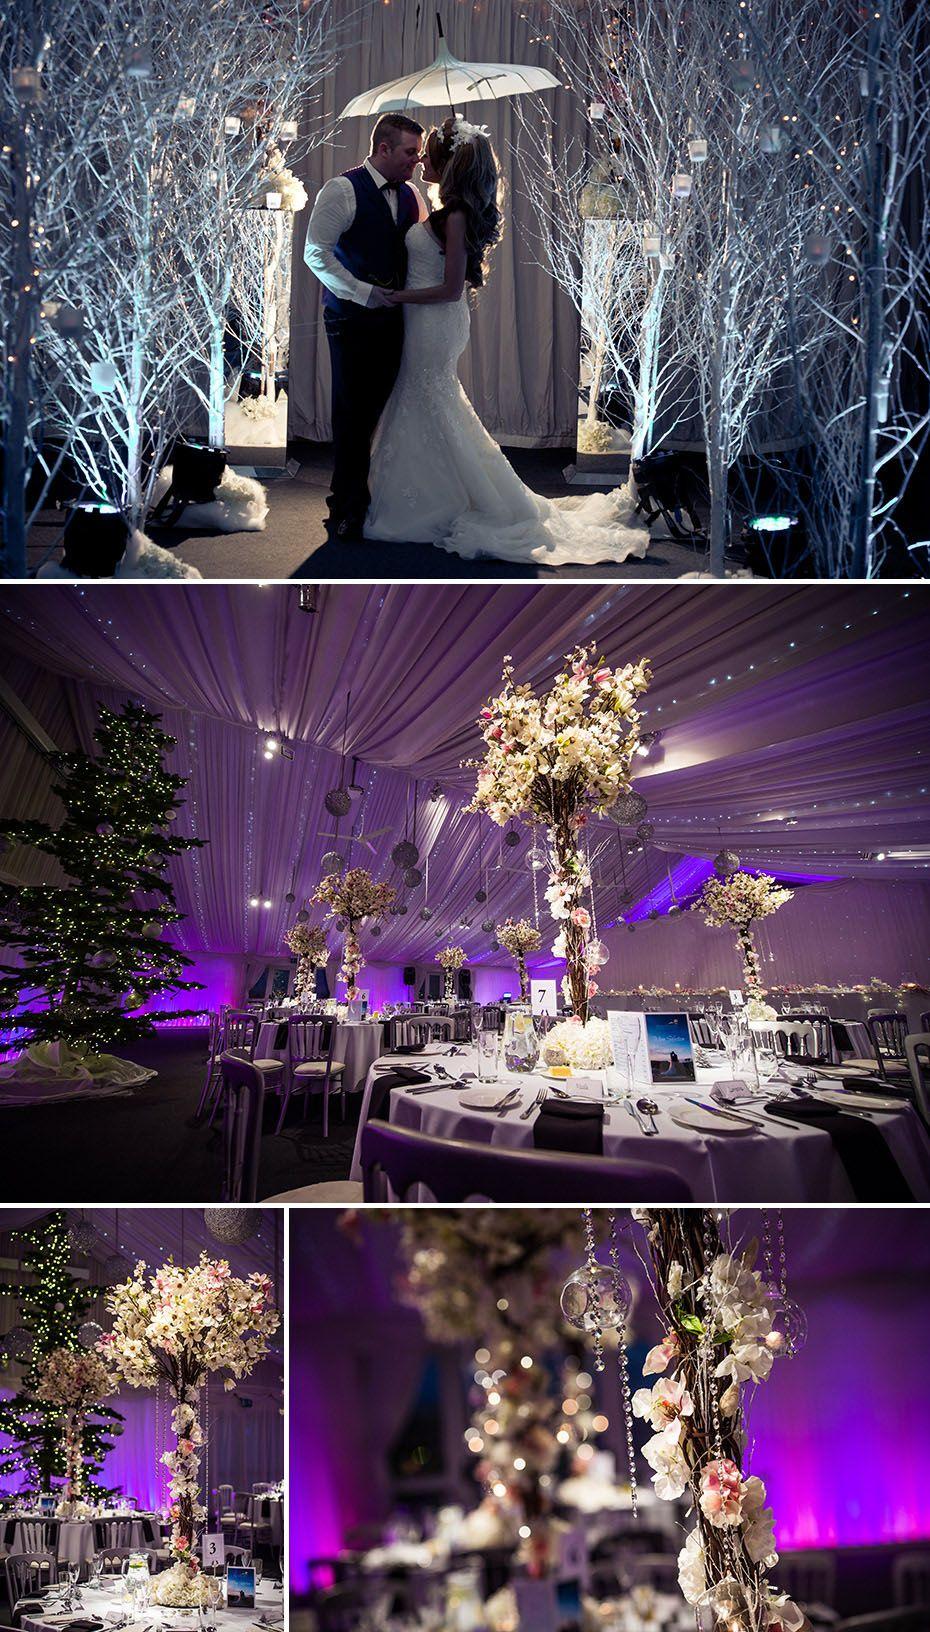 winter weddings the heaton house farm winter wonderland. Black Bedroom Furniture Sets. Home Design Ideas